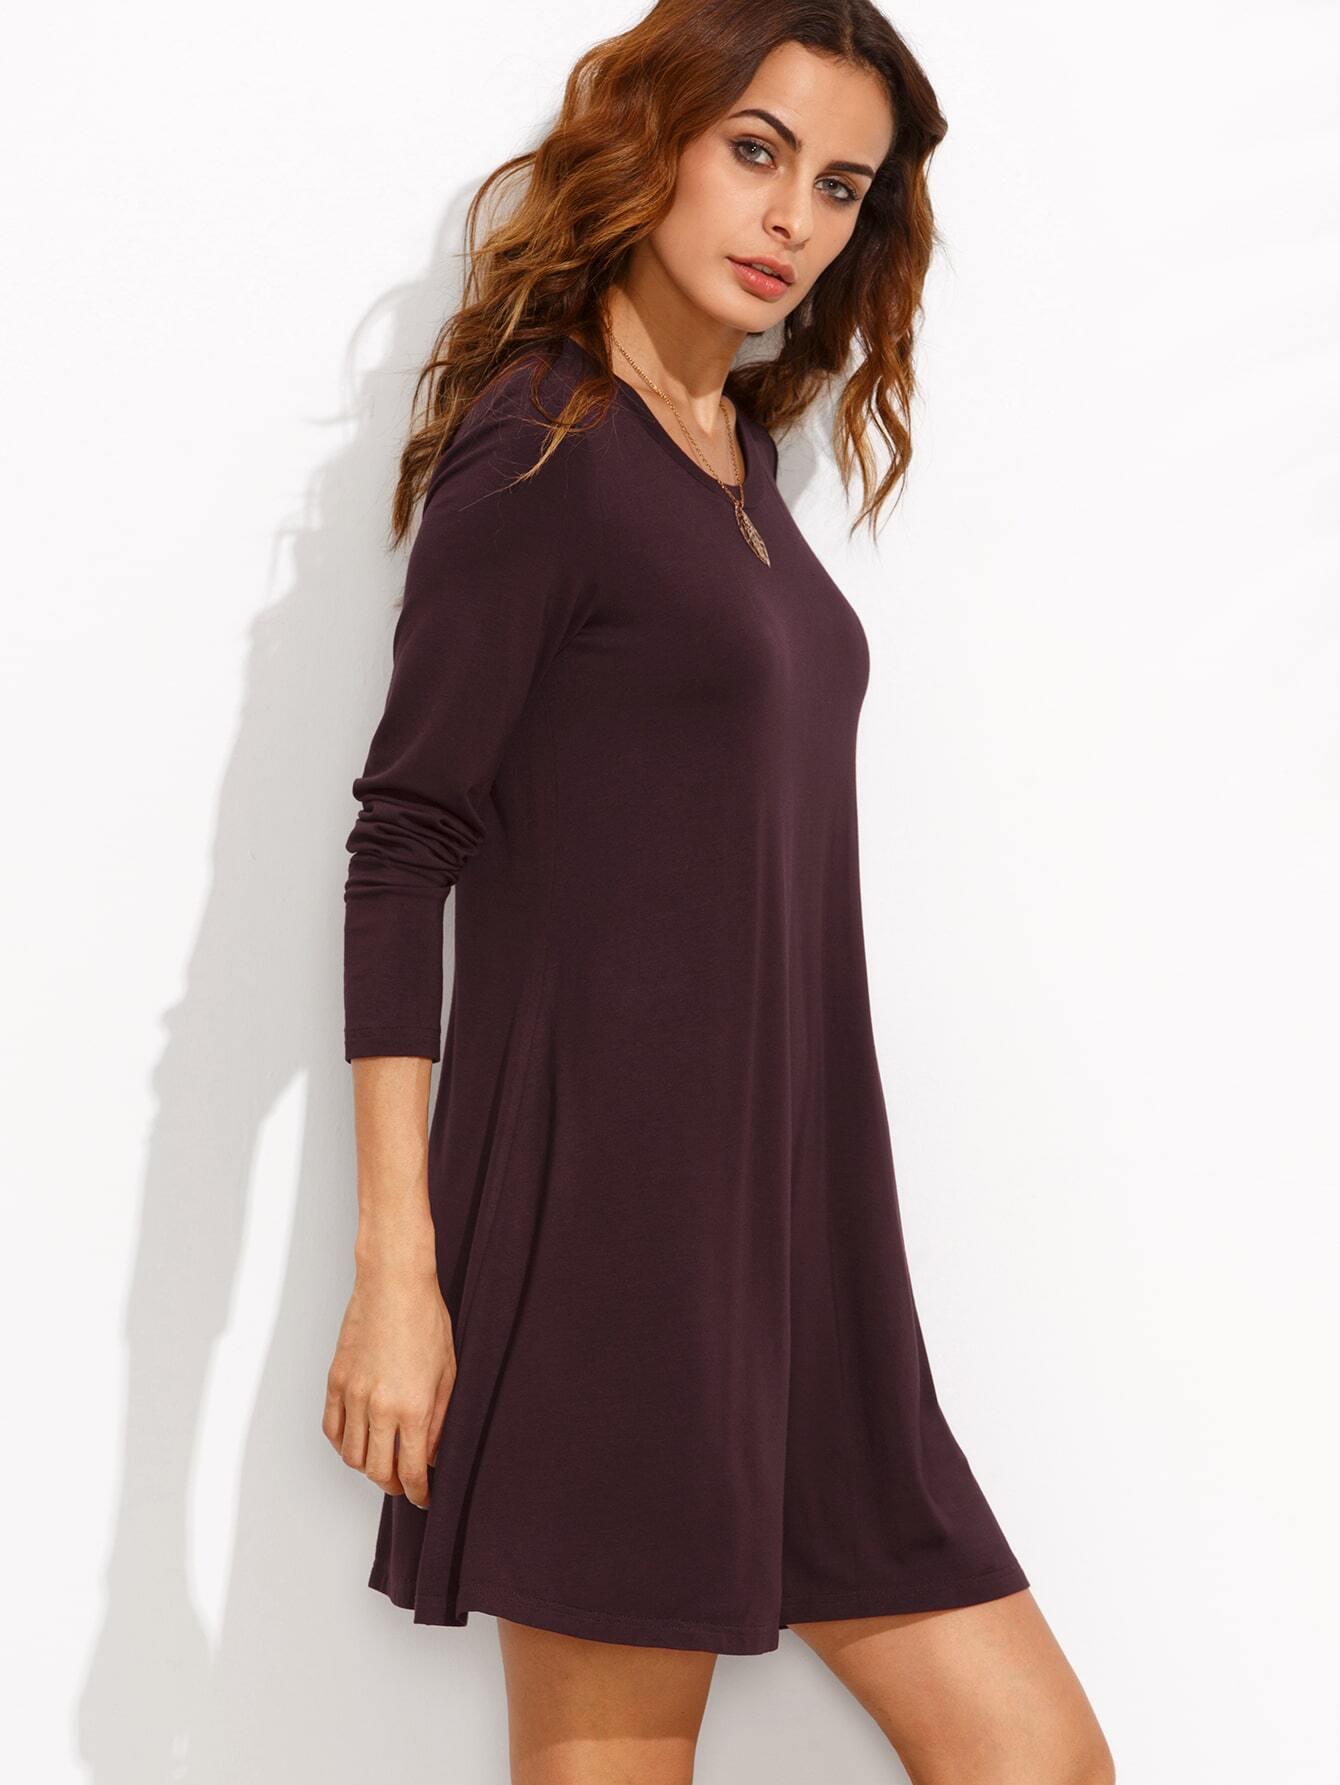 Burgundy Long Sleeve T-shirt Dress EmmaCloth-Women Fast ...